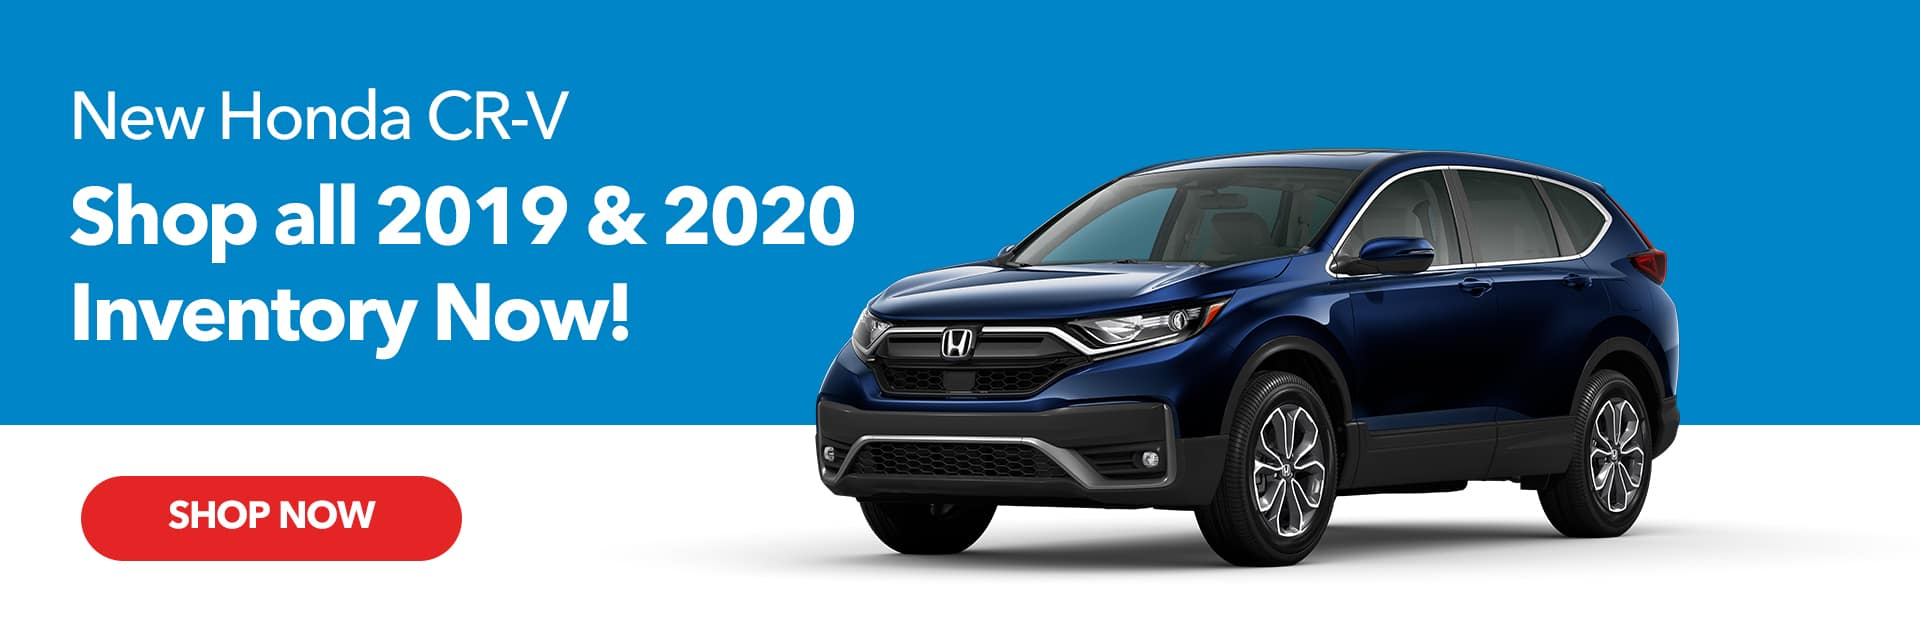 Link to January Offers - Honda CR-V